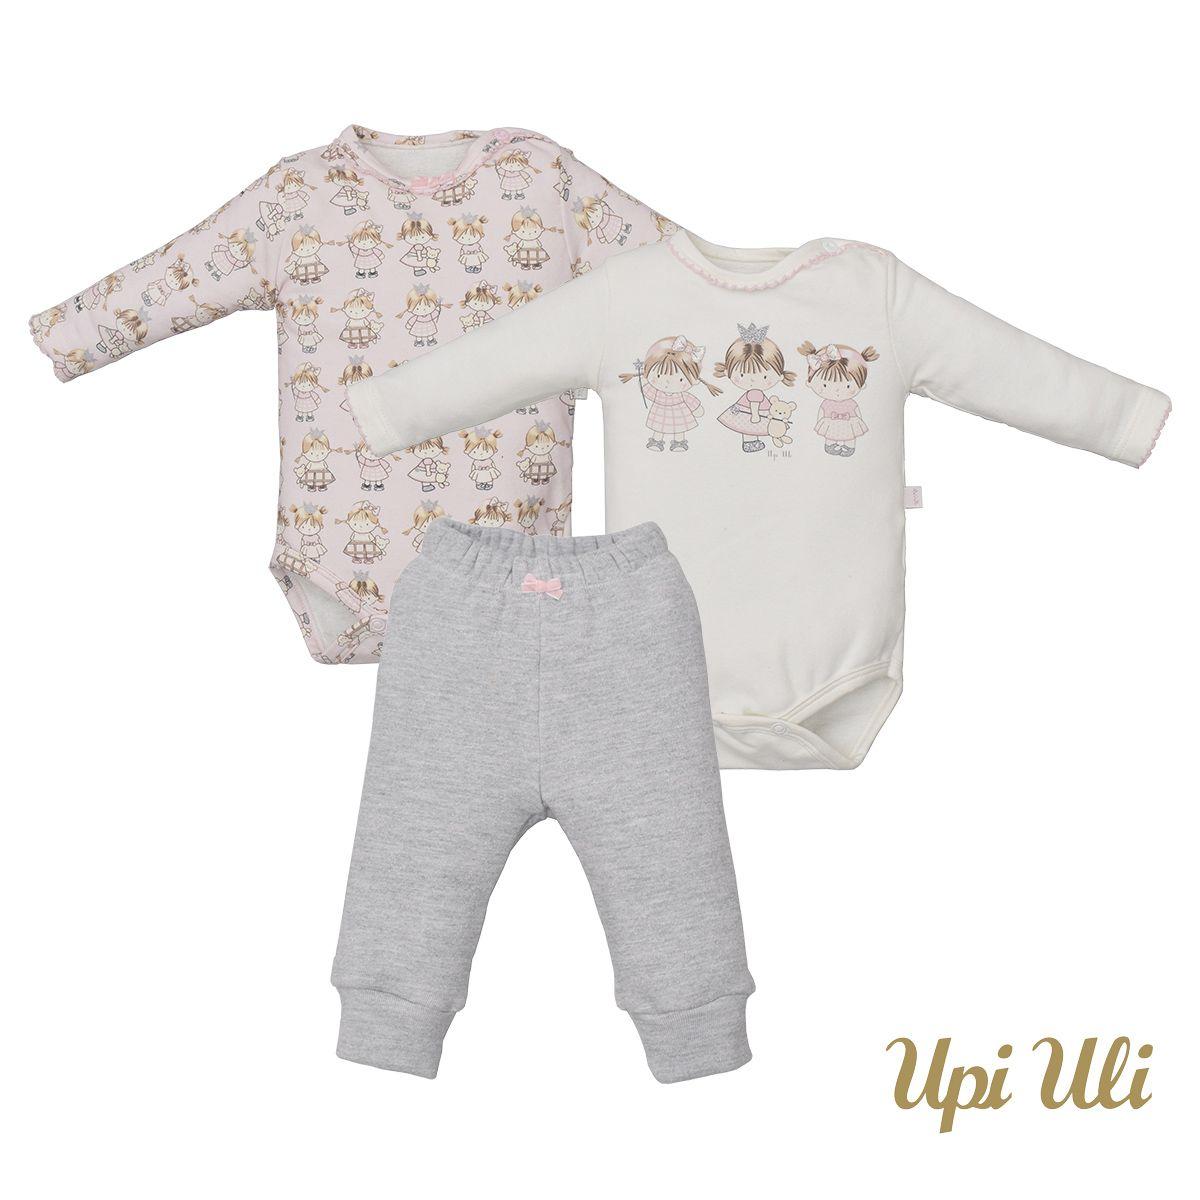 Kit Bebê 2 Bodys C/ 1 Culote Soft Comfort/Plush Nuvem Ana Julia